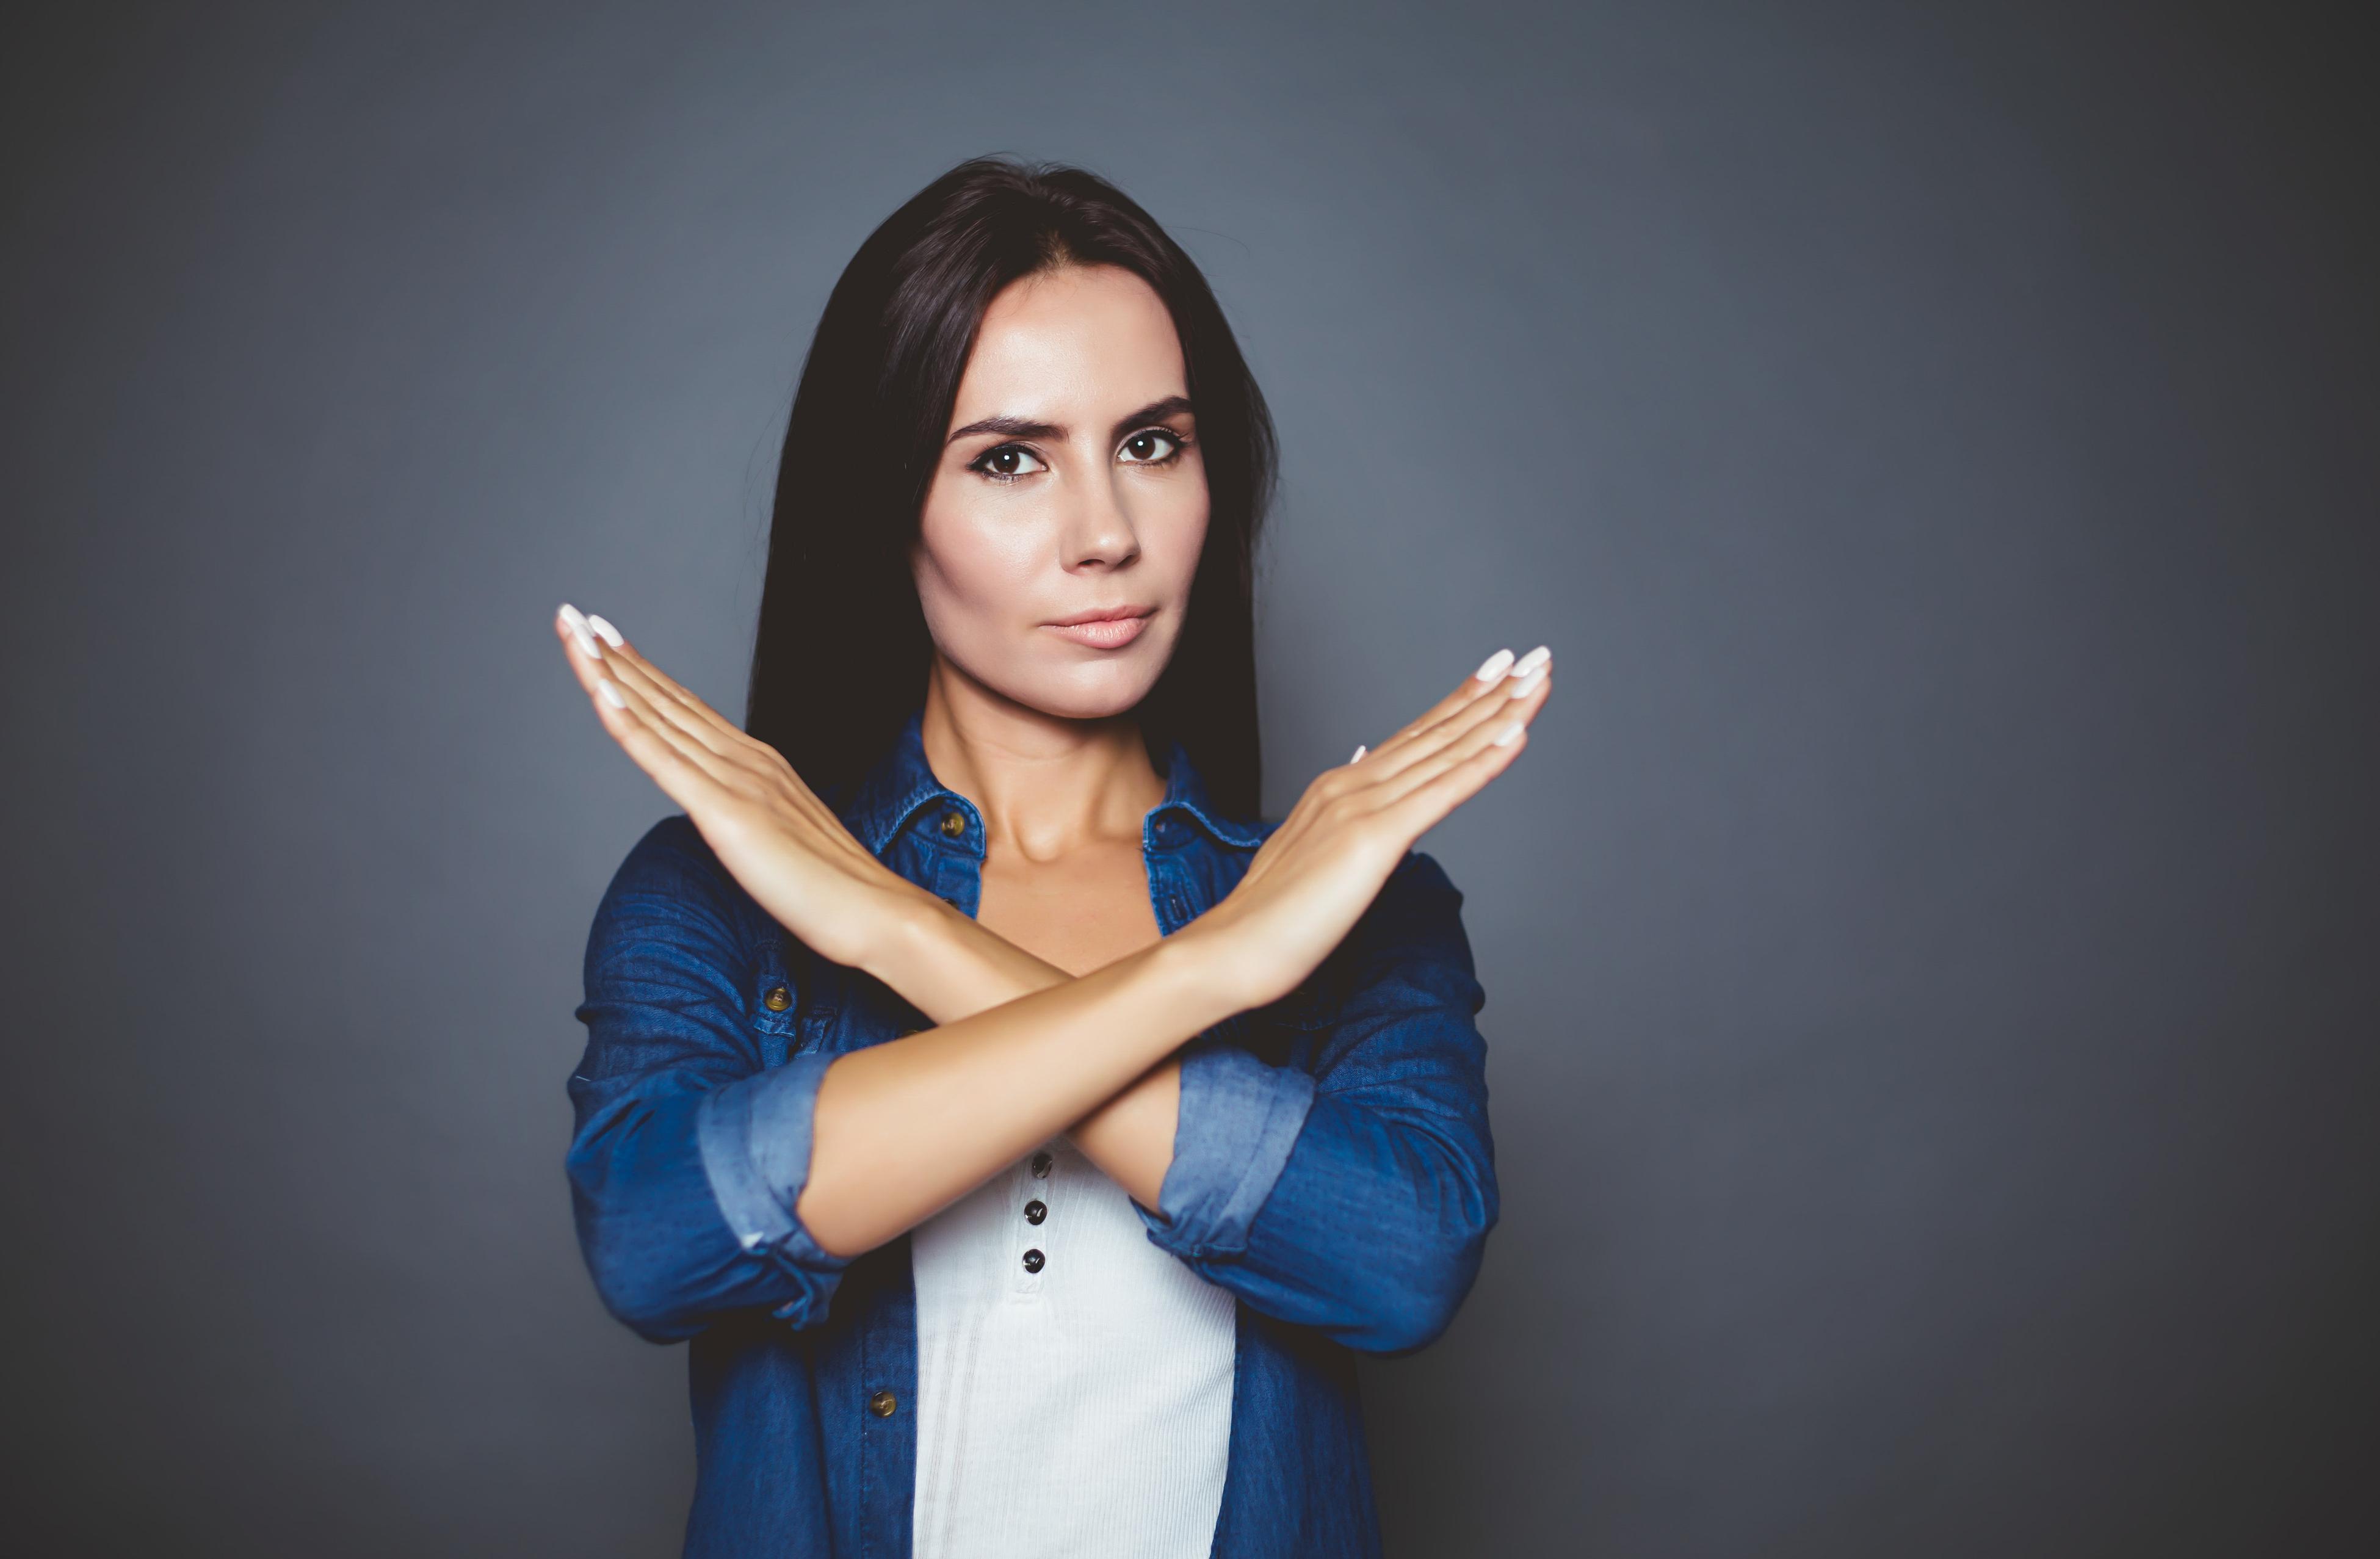 Body Language Etiquette: 7 Gestures to Avoid - Diane Gottsman